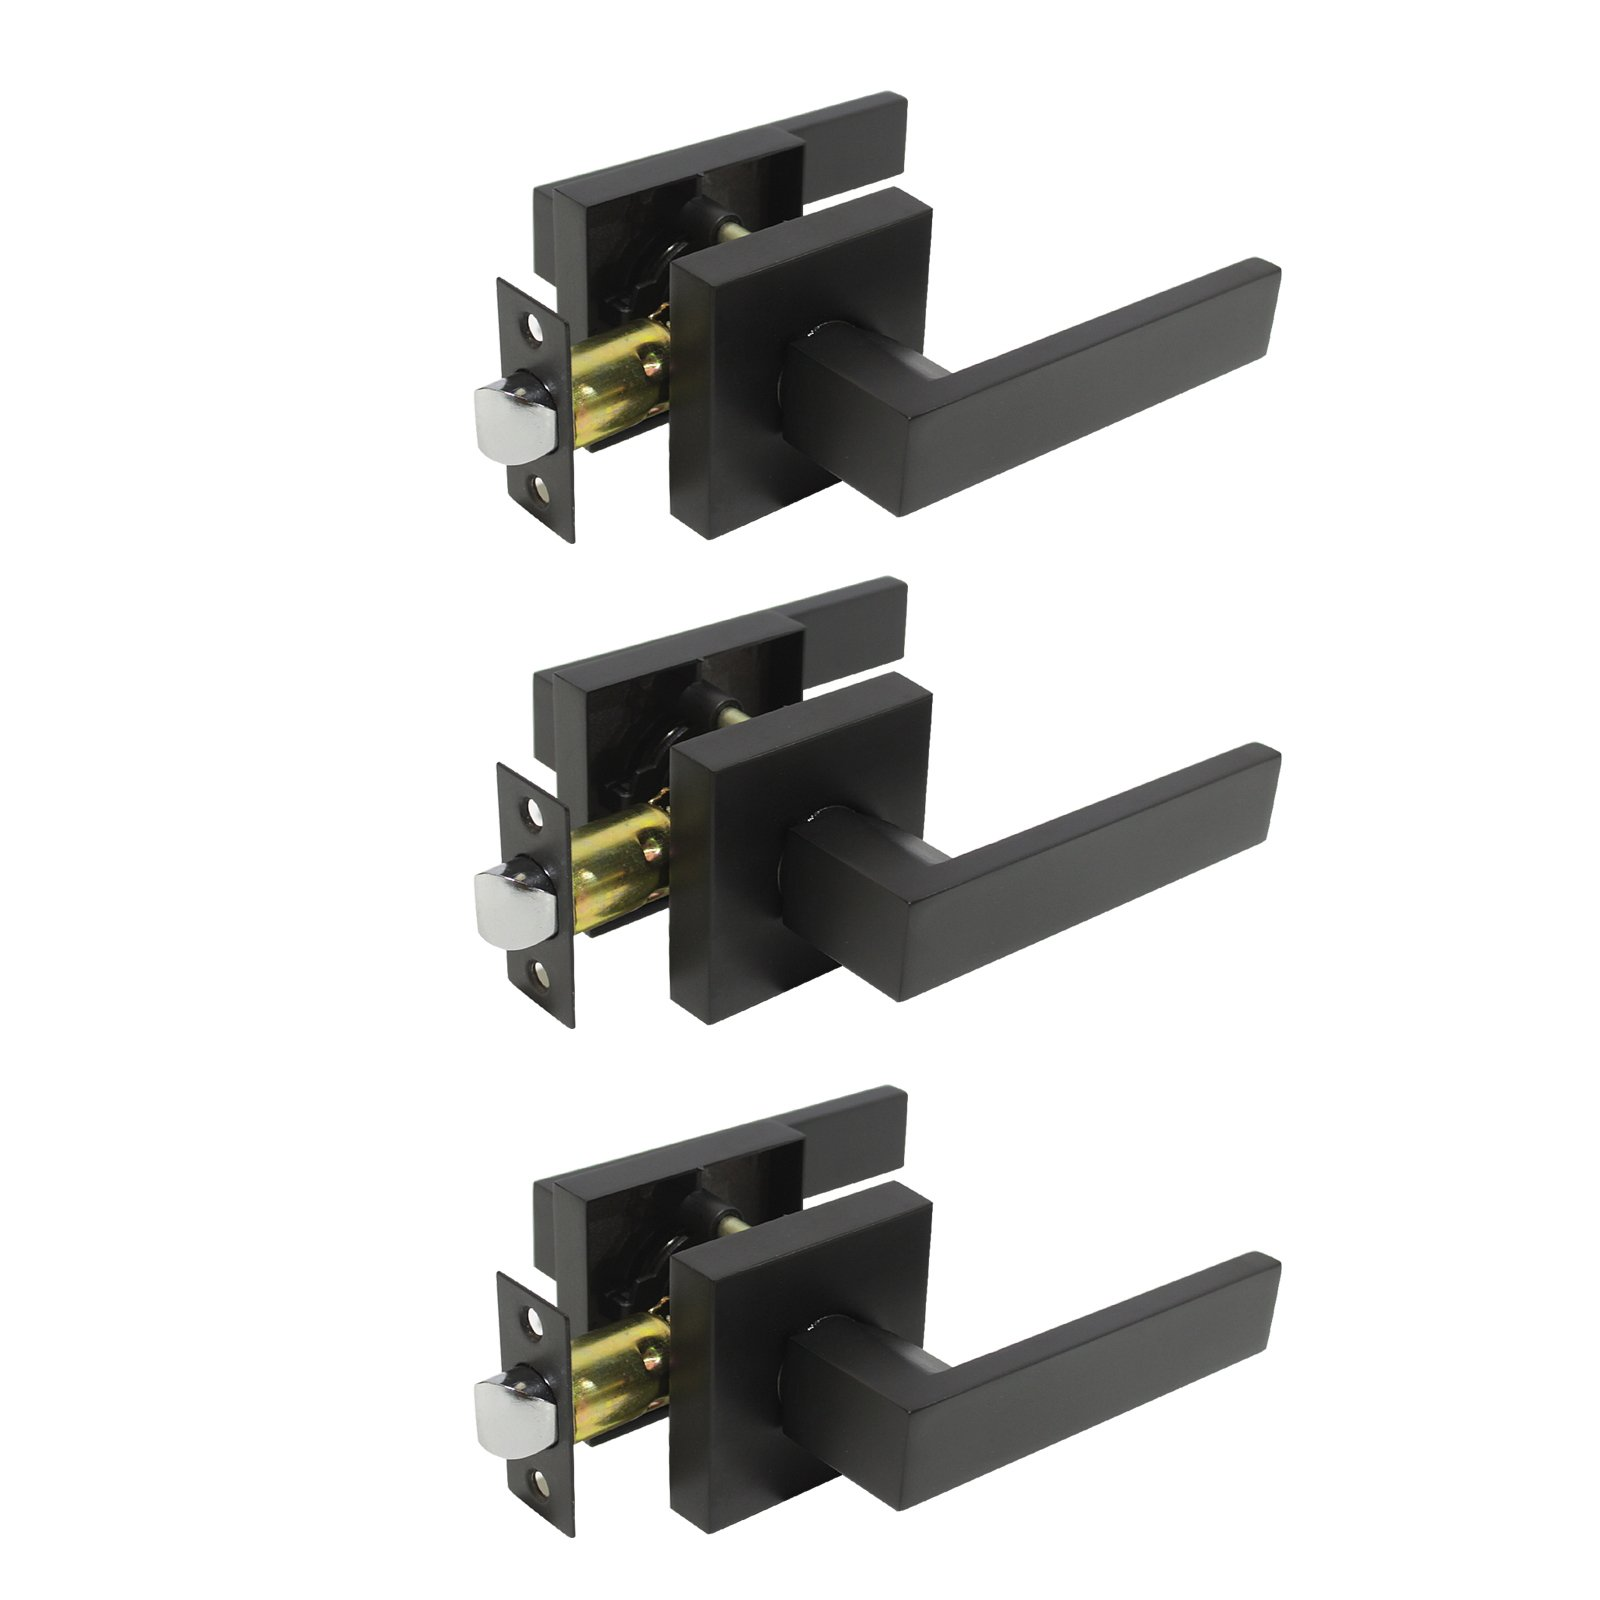 3 Pack Probrico Square Door Lever Door Lock Handle Lockset Keyless Doorknobs Passage Knobs Lockset Interior Hallway Passage Closet DL01-BK-PS in Black